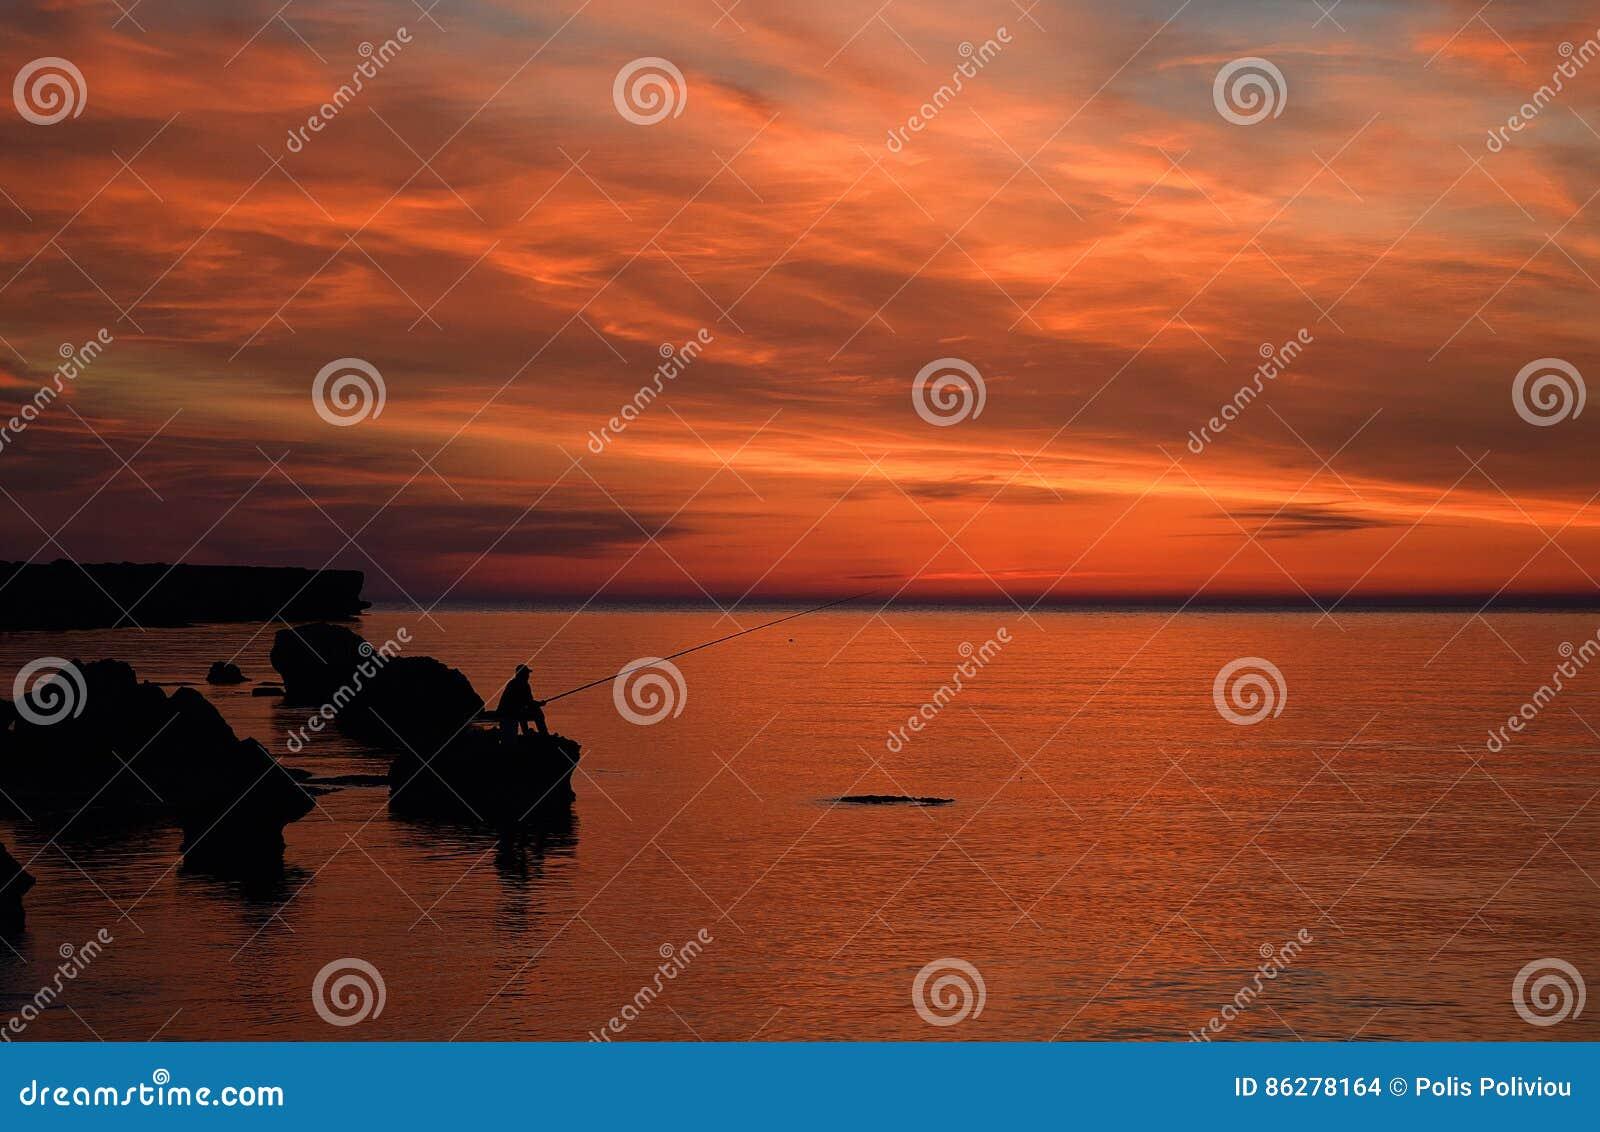 Site de rencontres Cap oriental